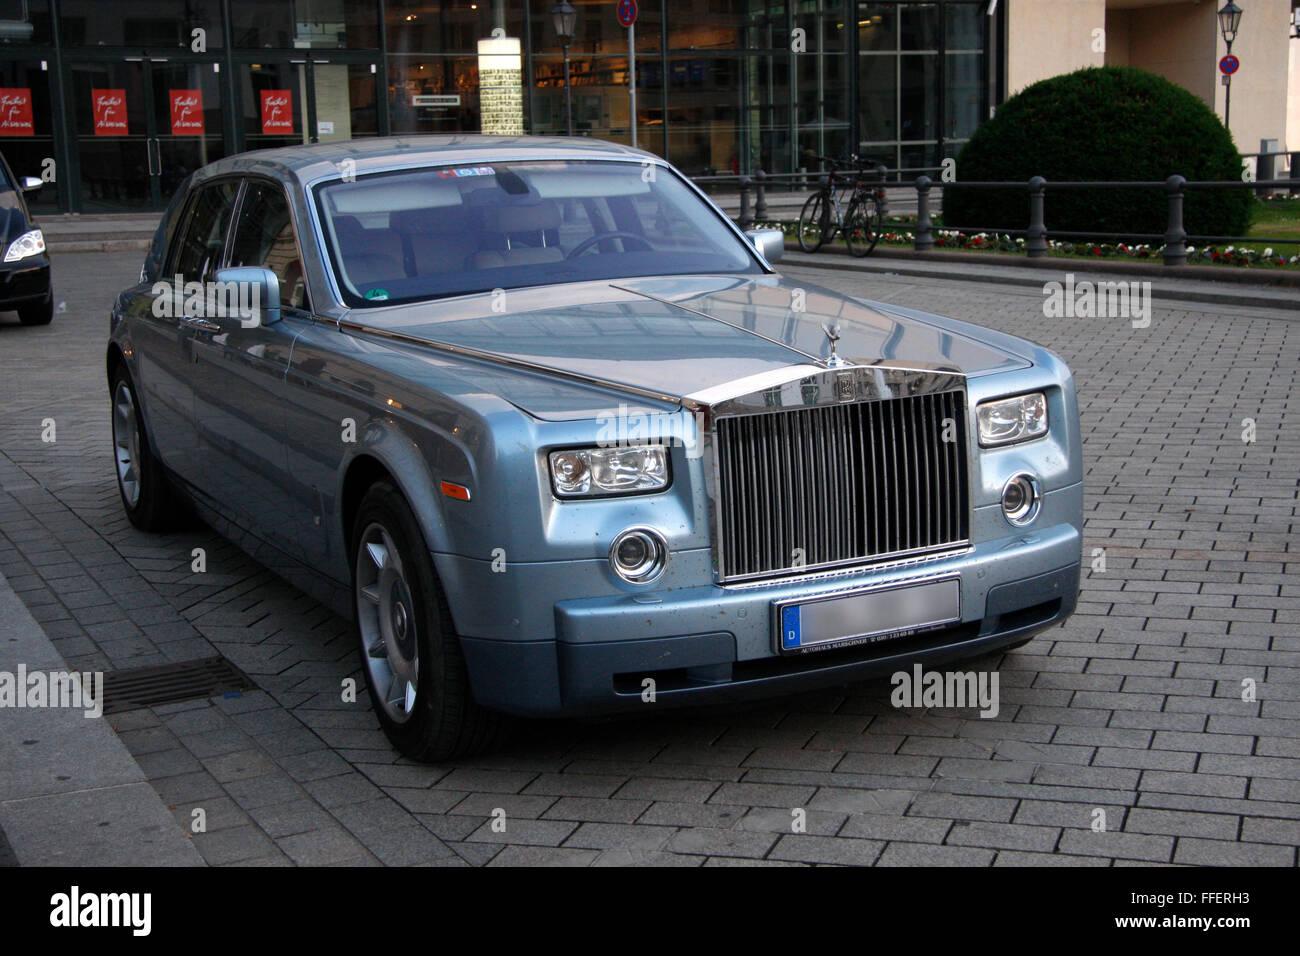 Rolls Royce Phantom. - Stock Image